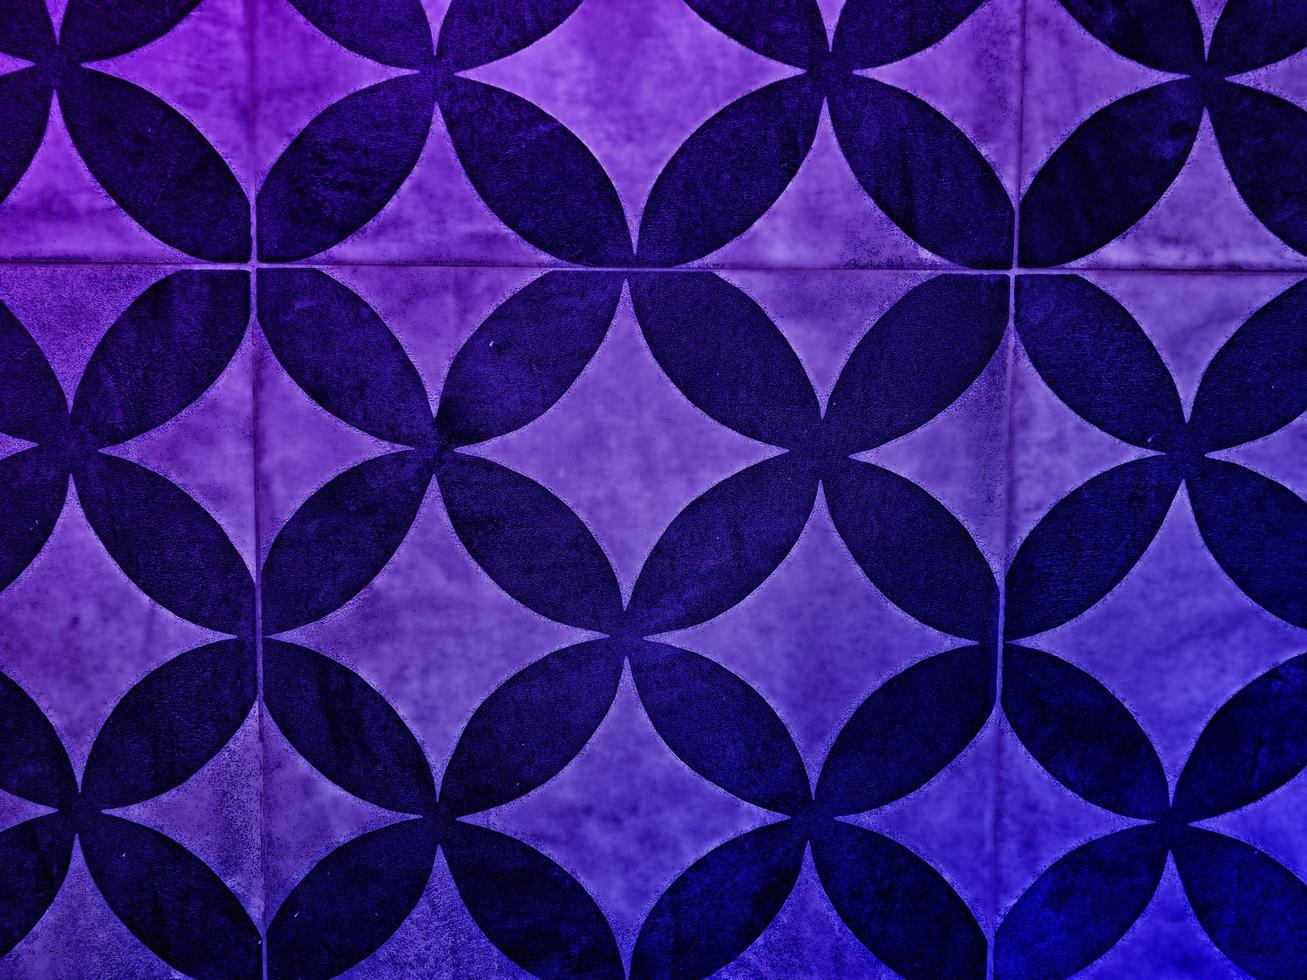 Blue Stone Texture photo